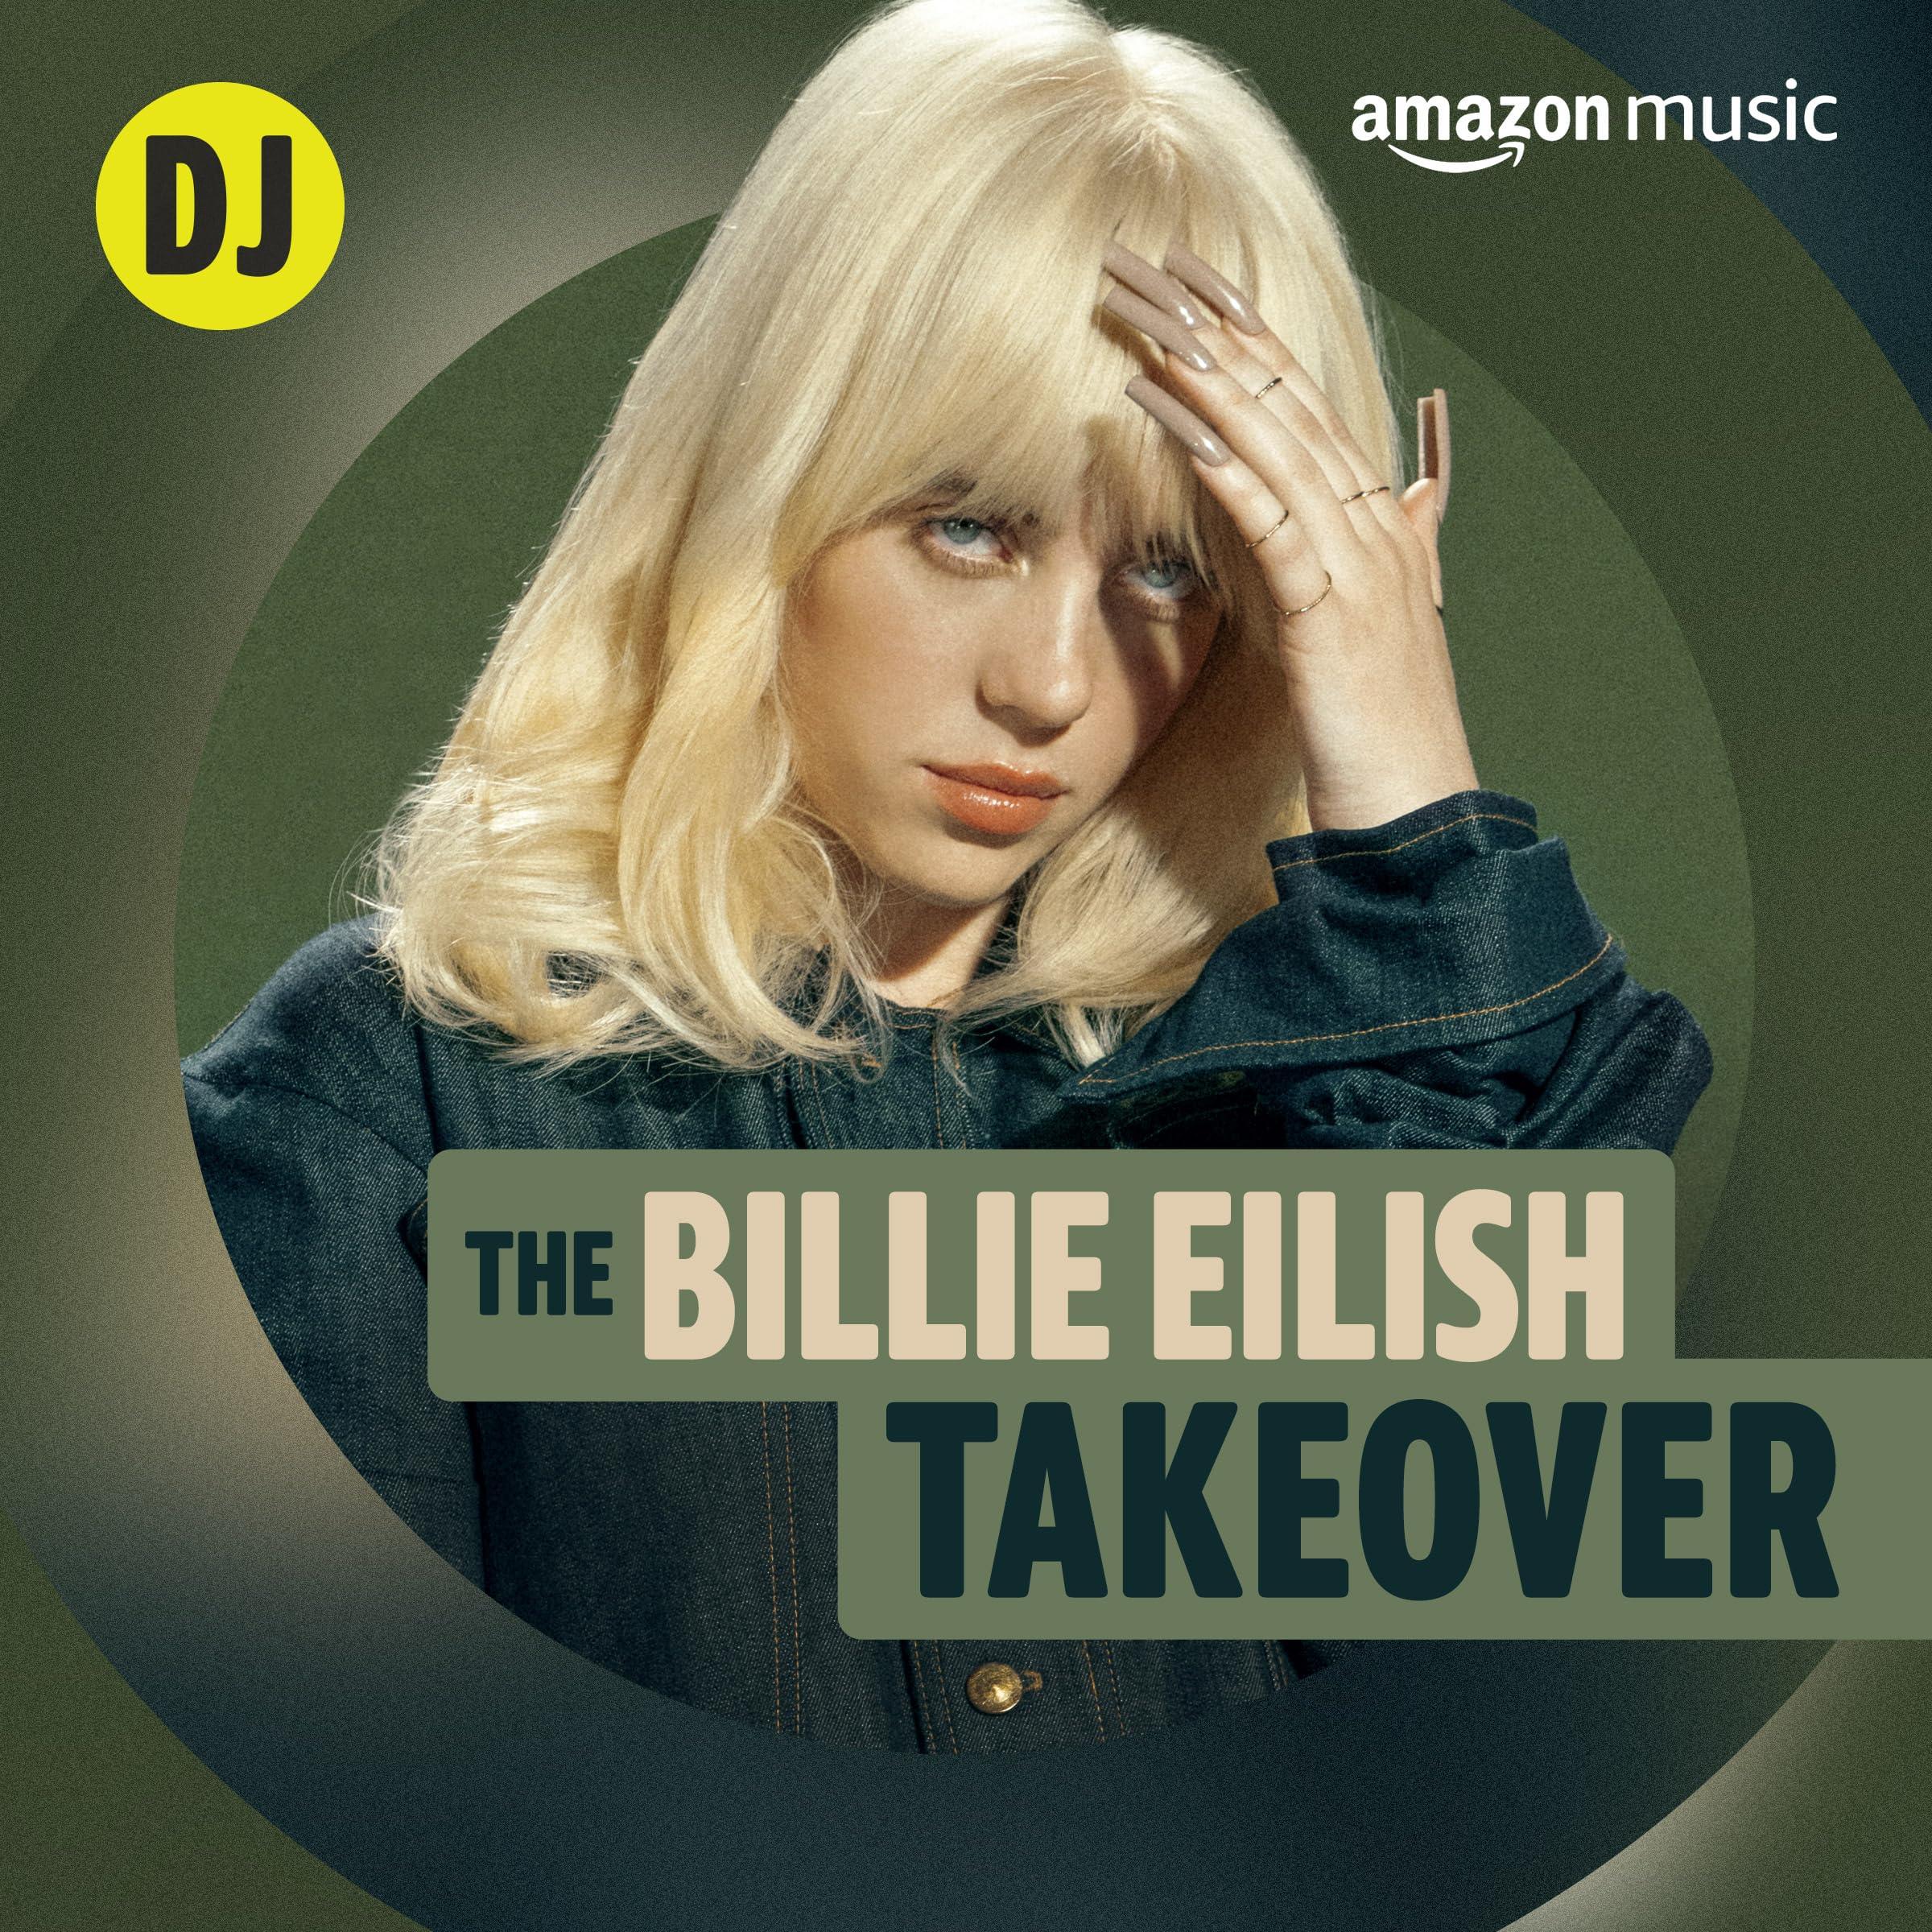 The Billie Eilish Takeover